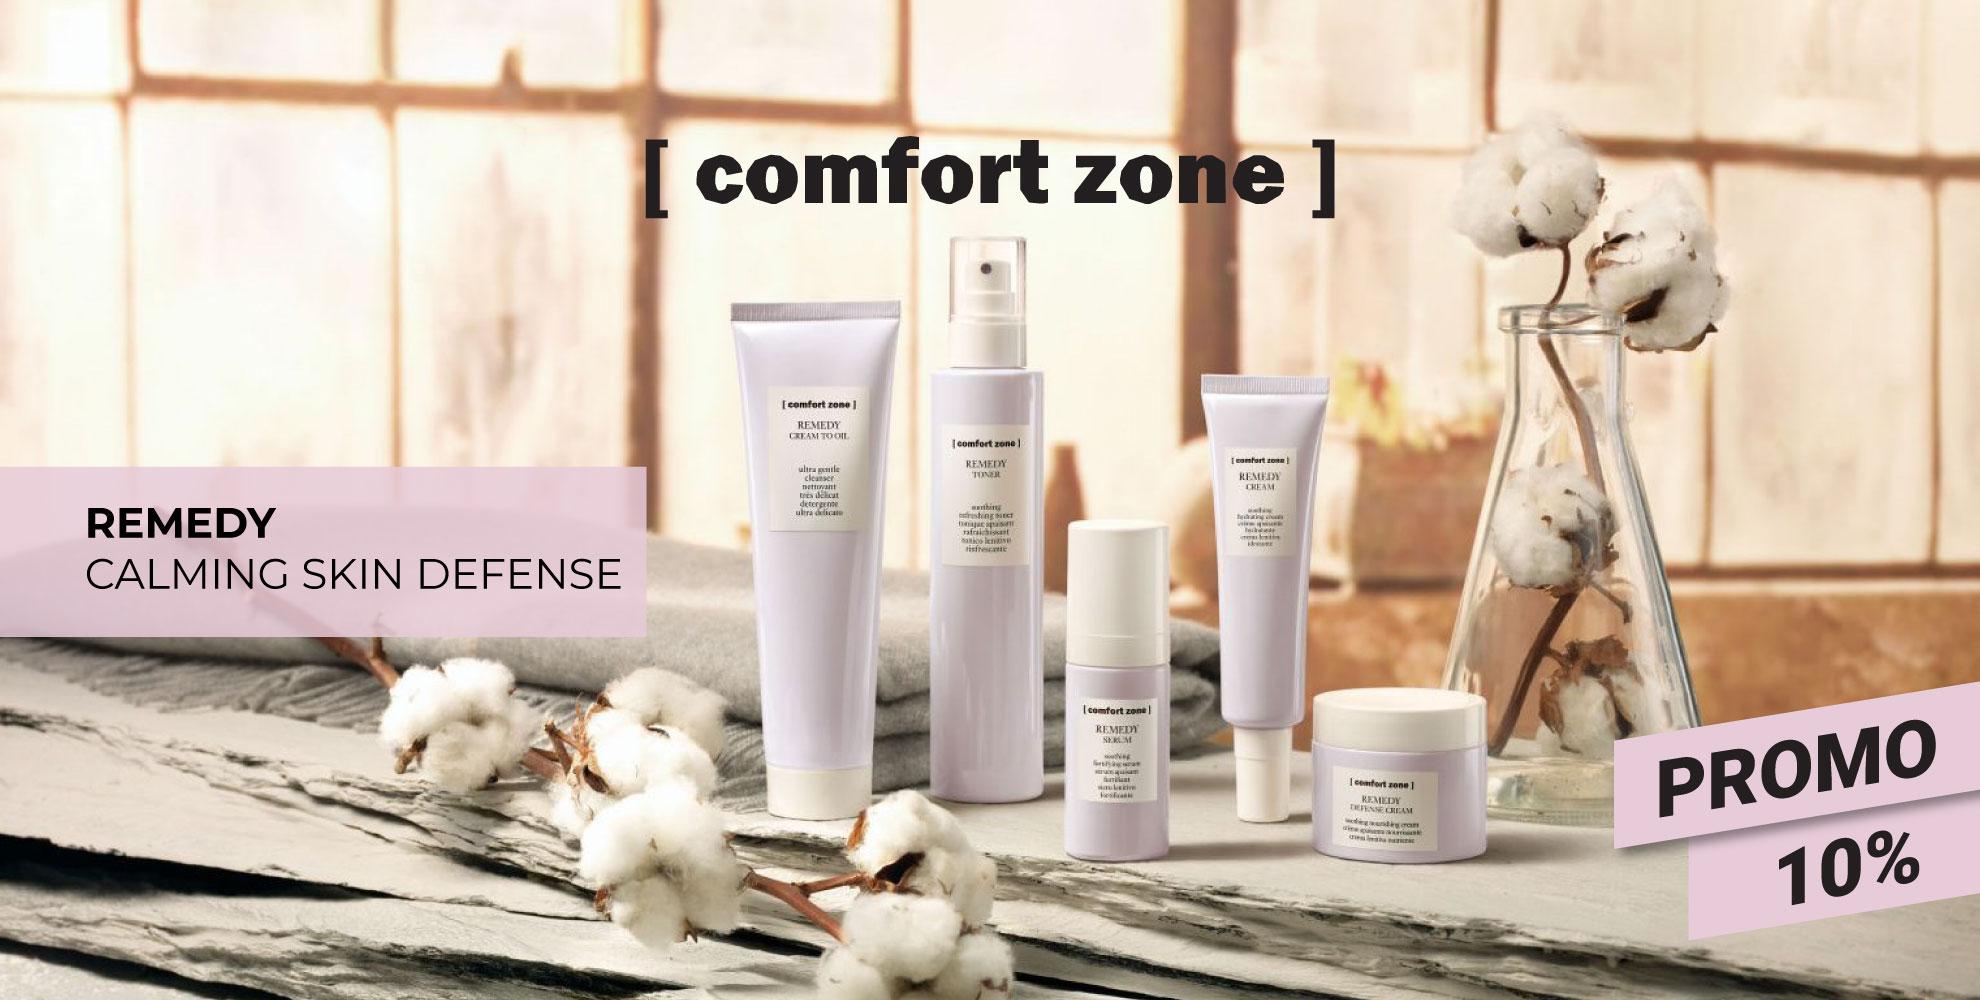 Comfort Zone Remedy